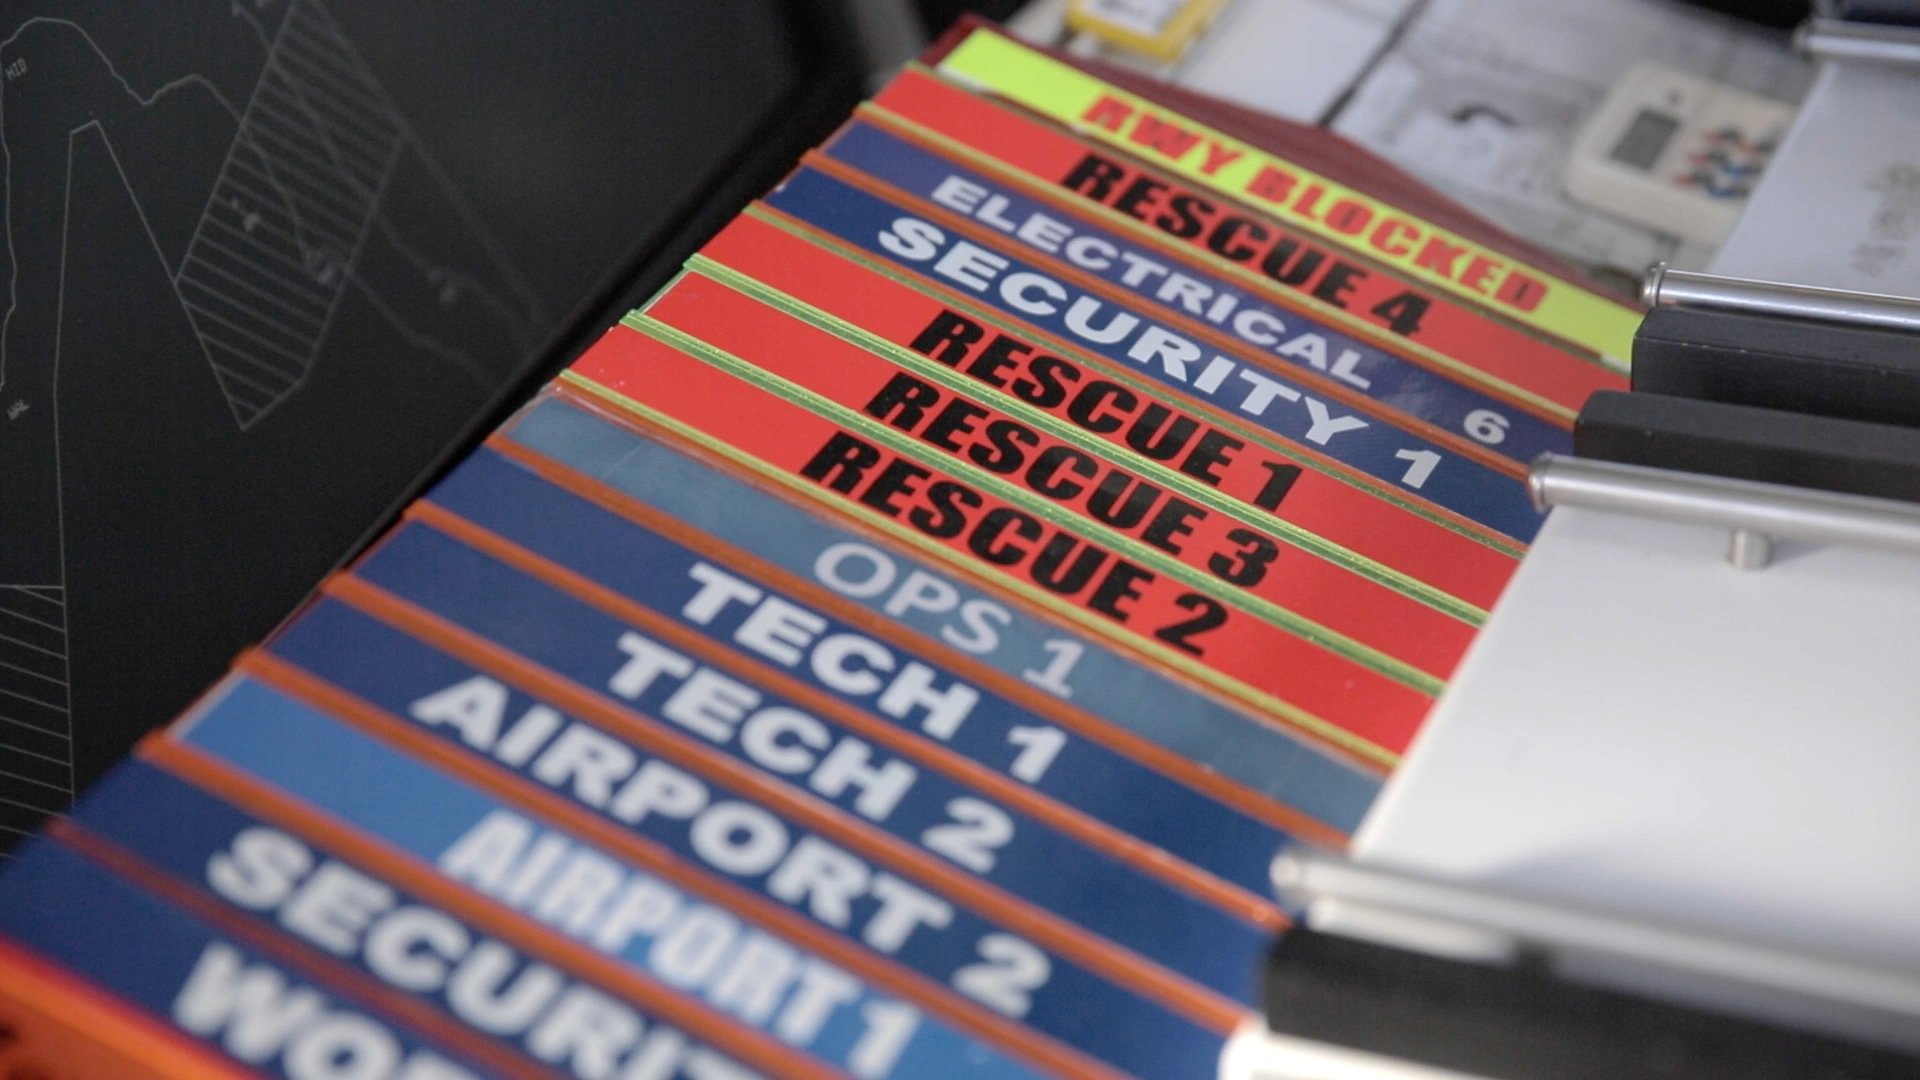 Flight Operations Risk Assessment—Northern Australia 2011